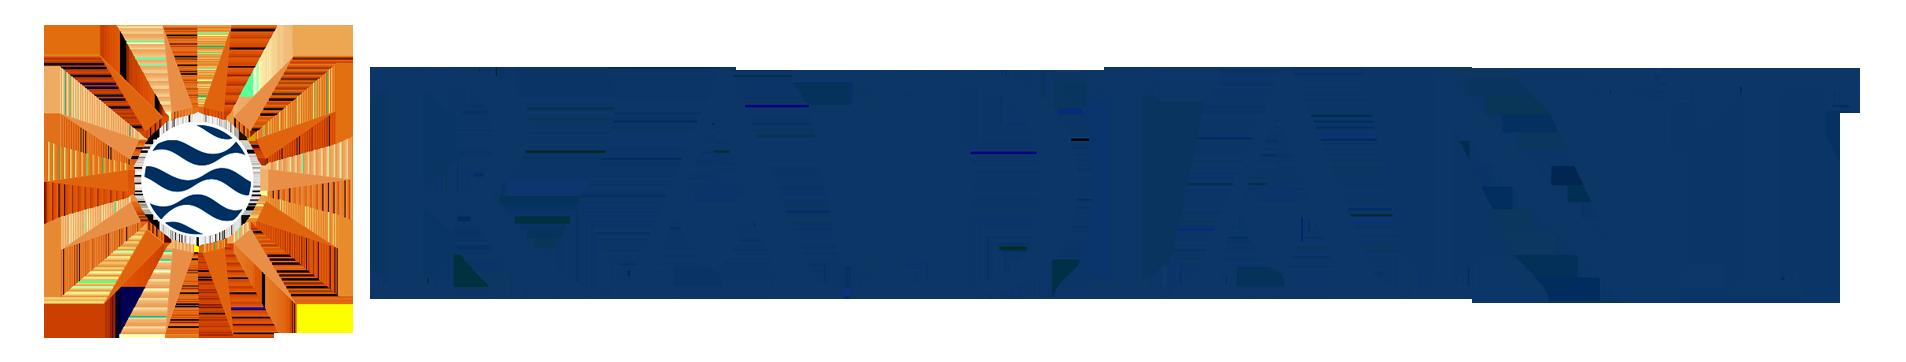 some logo